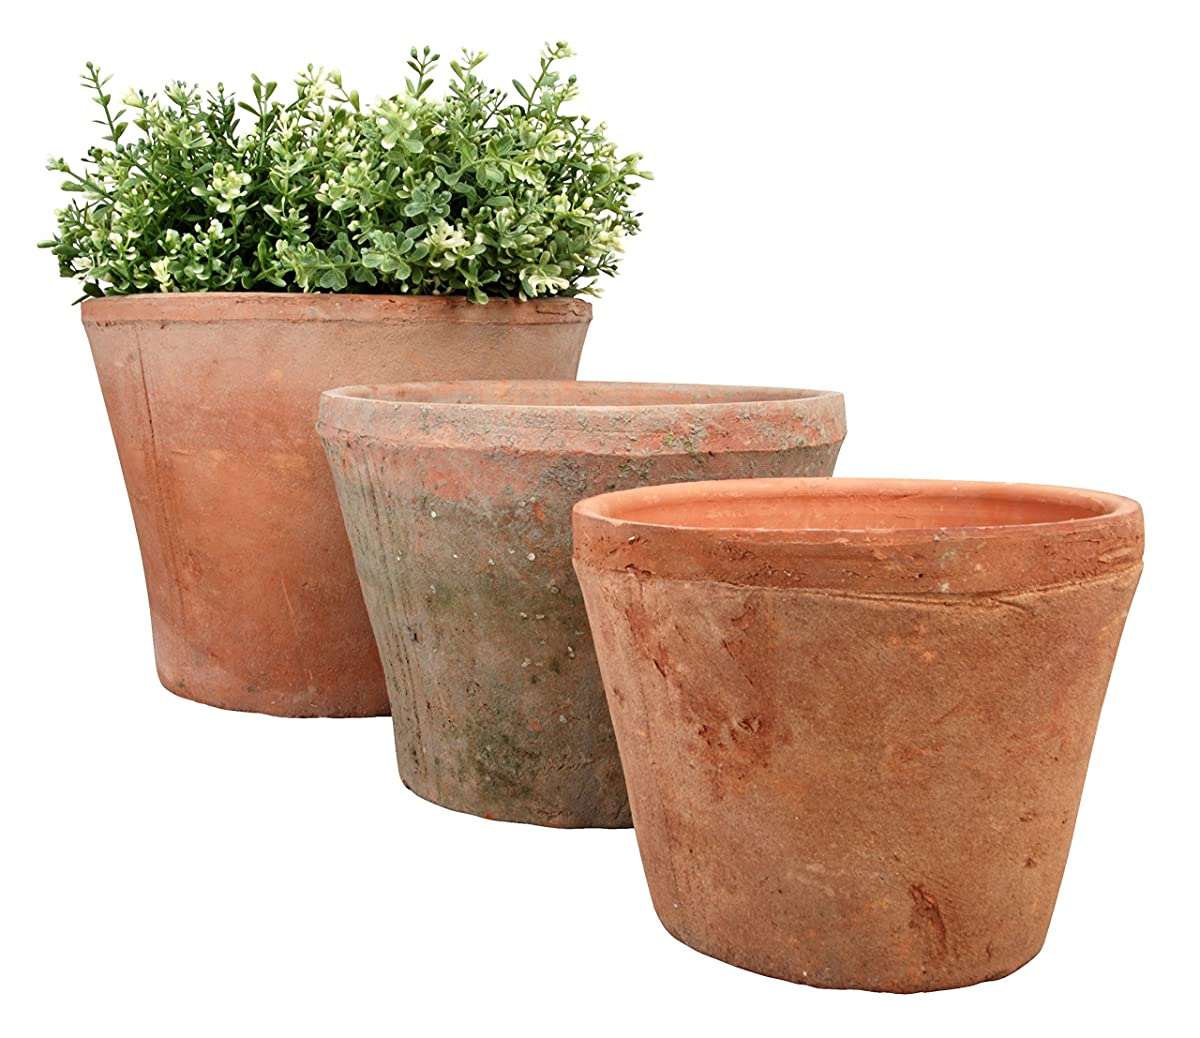 Aged Terra Cotta Pot